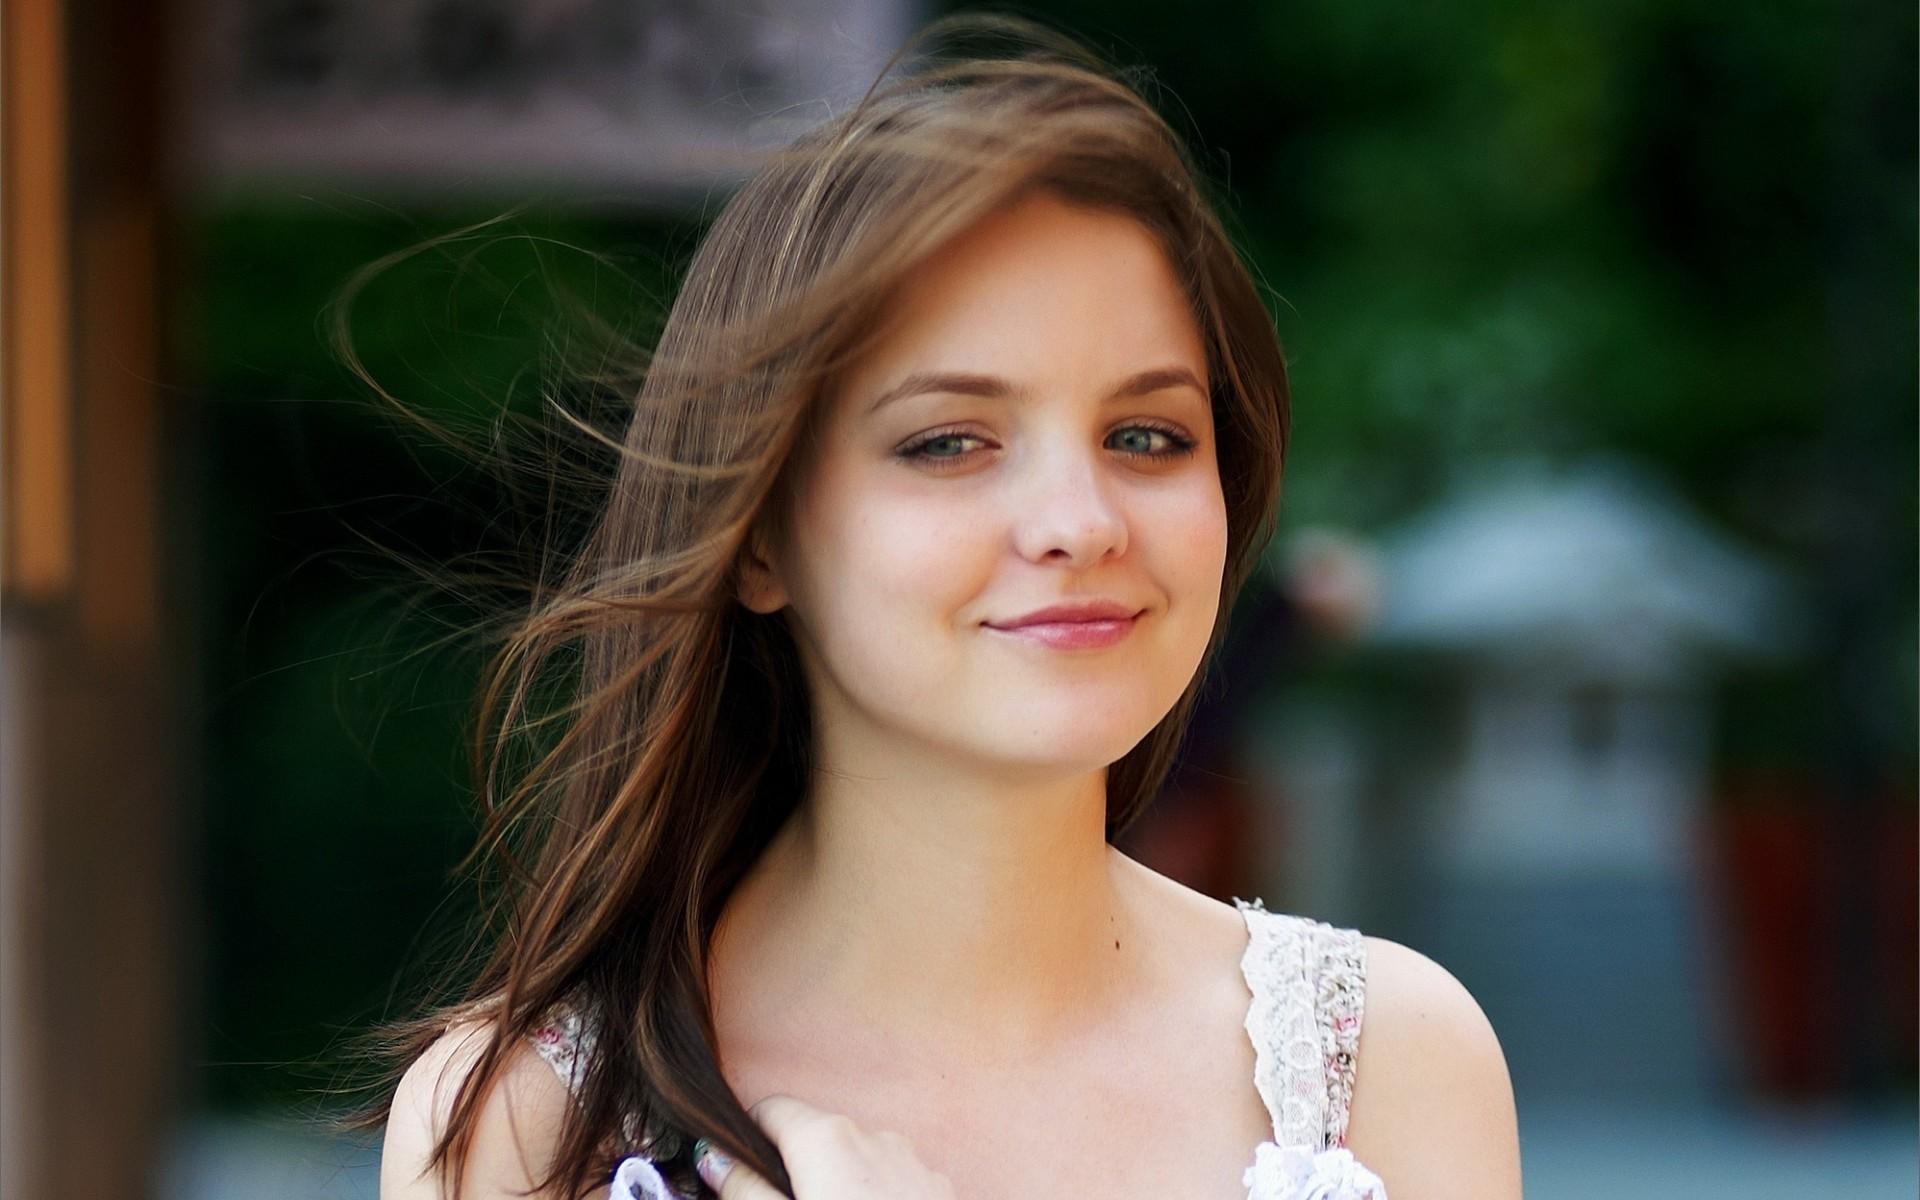 Filename: vWJiq3.jpg · view image. Found on: cute-teen-girl-wallpapers/